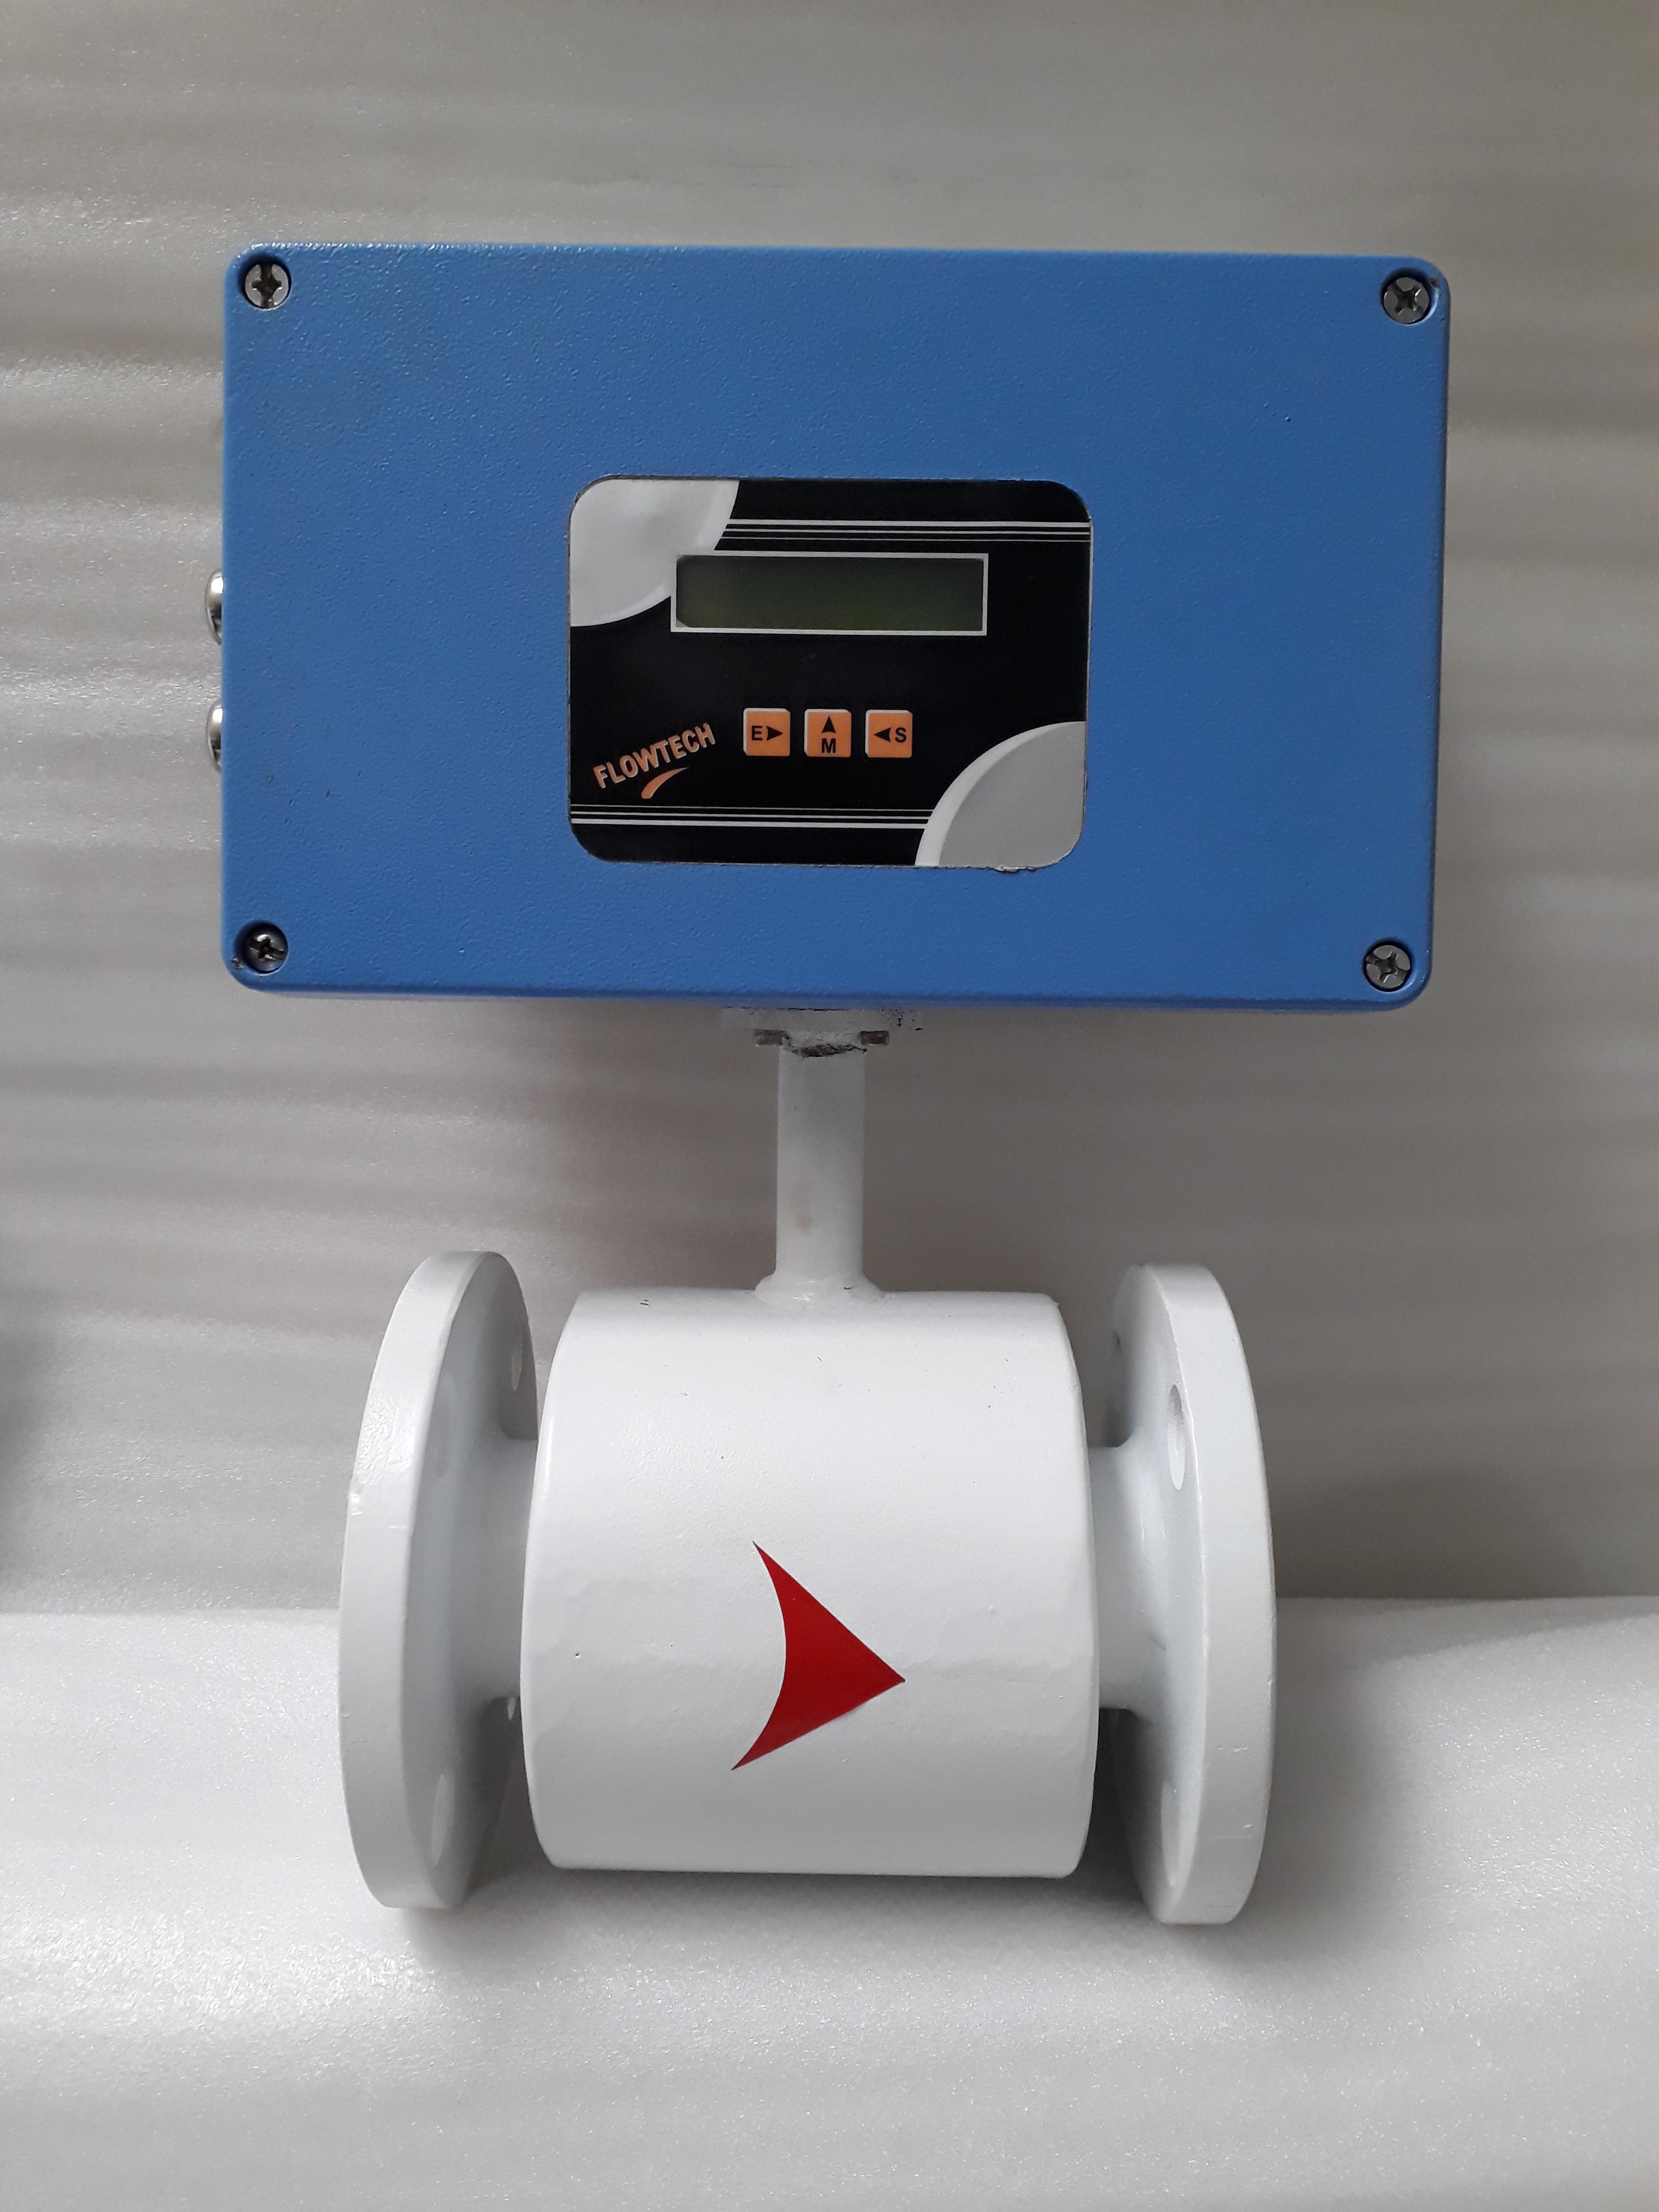 Flocounter Economical Digital Water Flow Meter